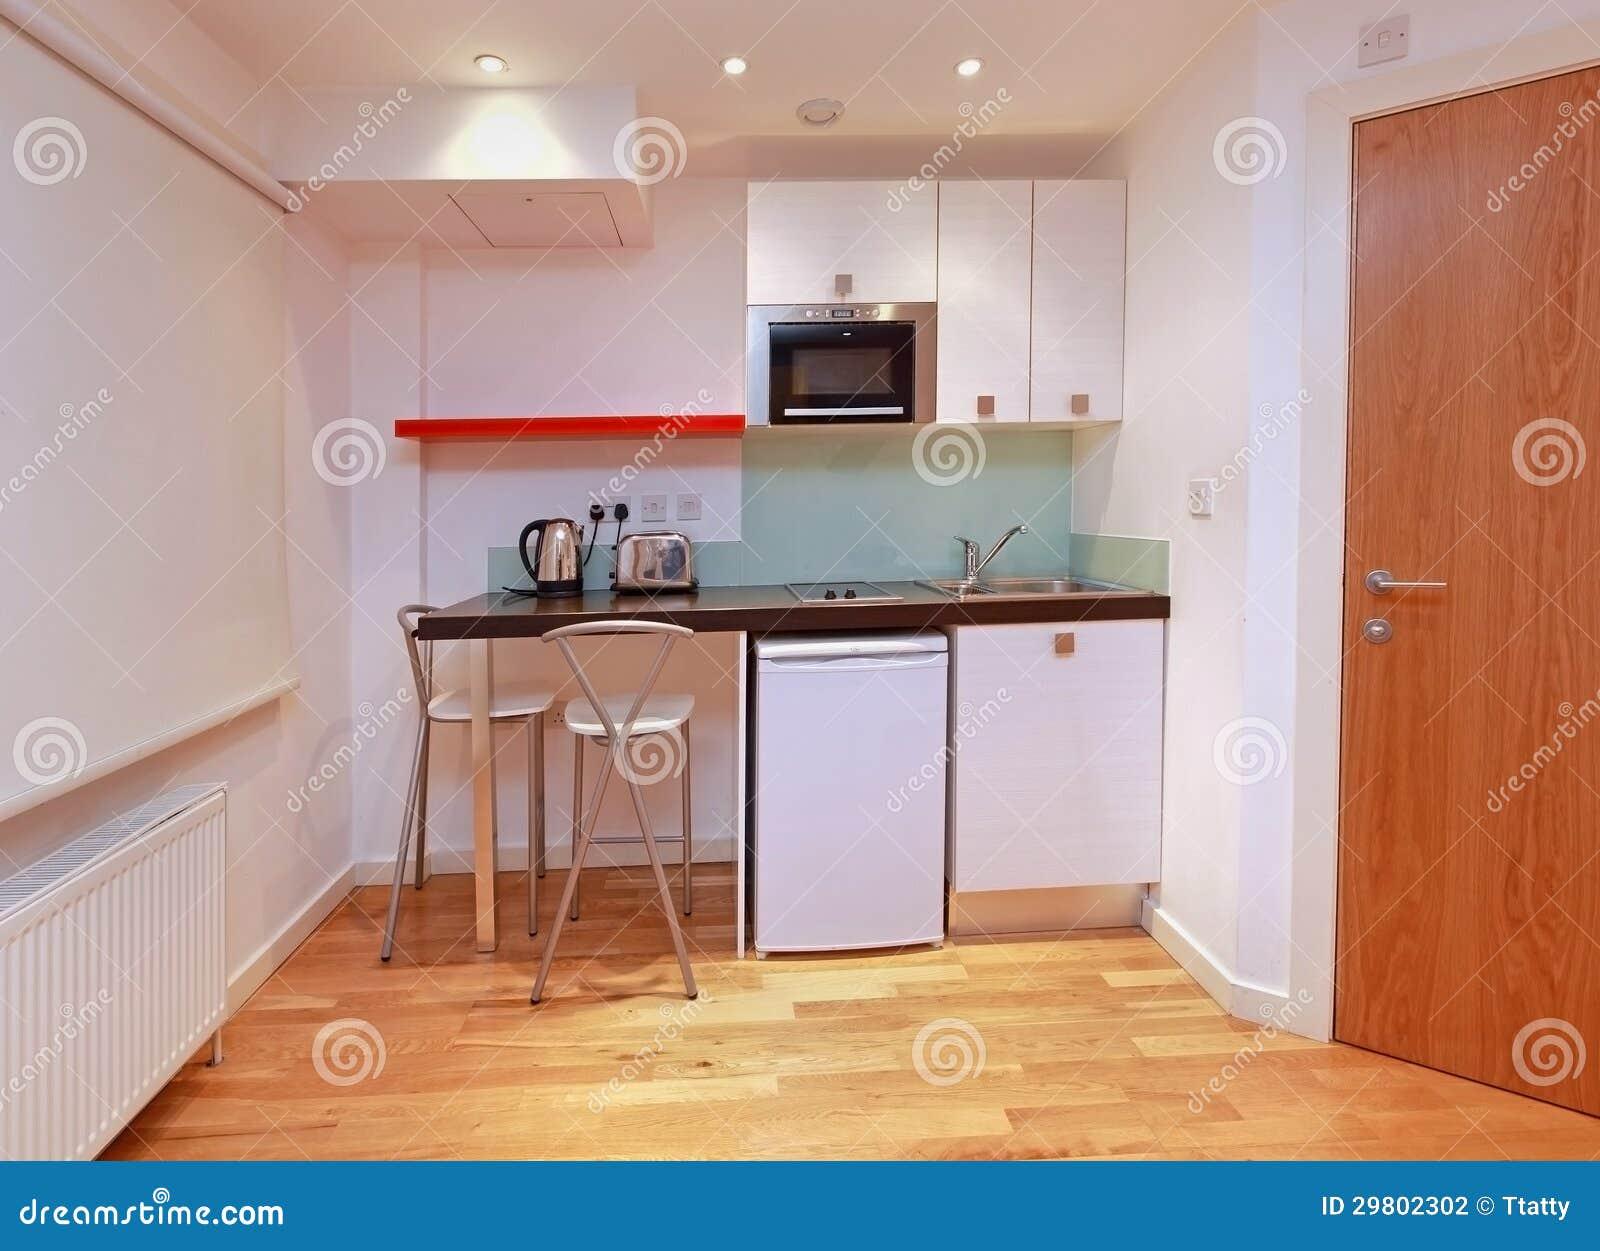 Piccola cucina moderna fotografia stock immagine 29802302 - Cucina piccola moderna ...